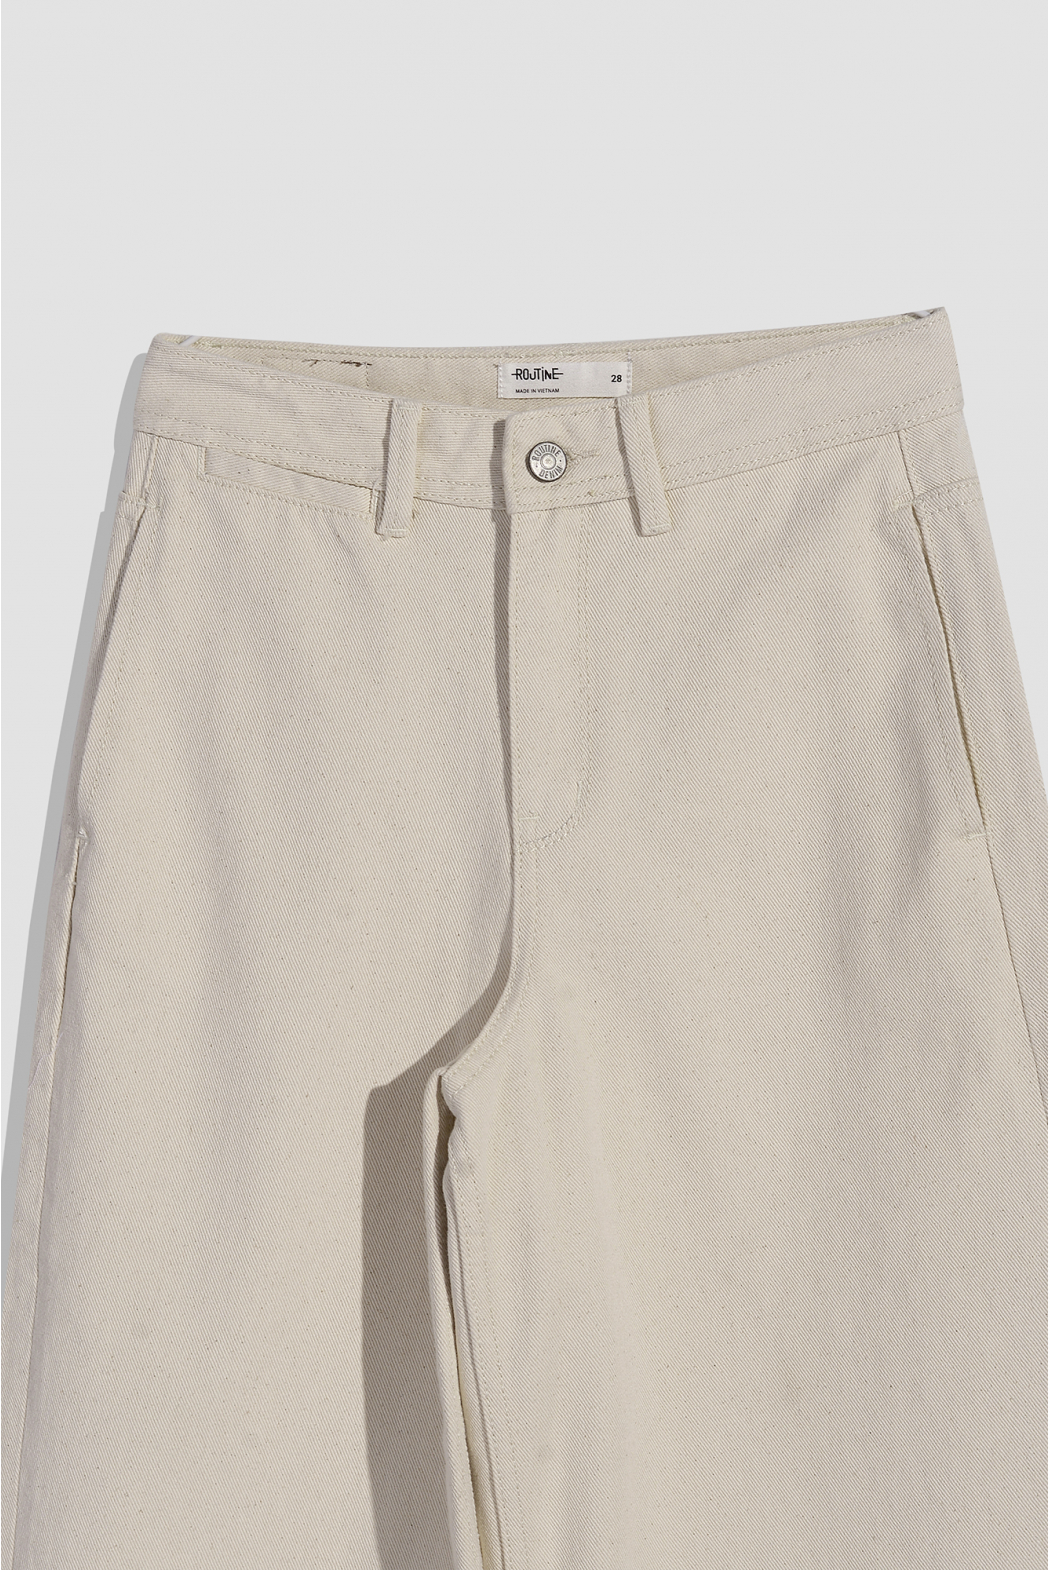 Quần Jean nữ lưng cao, 2 túi sườn - 10F20DPAW009